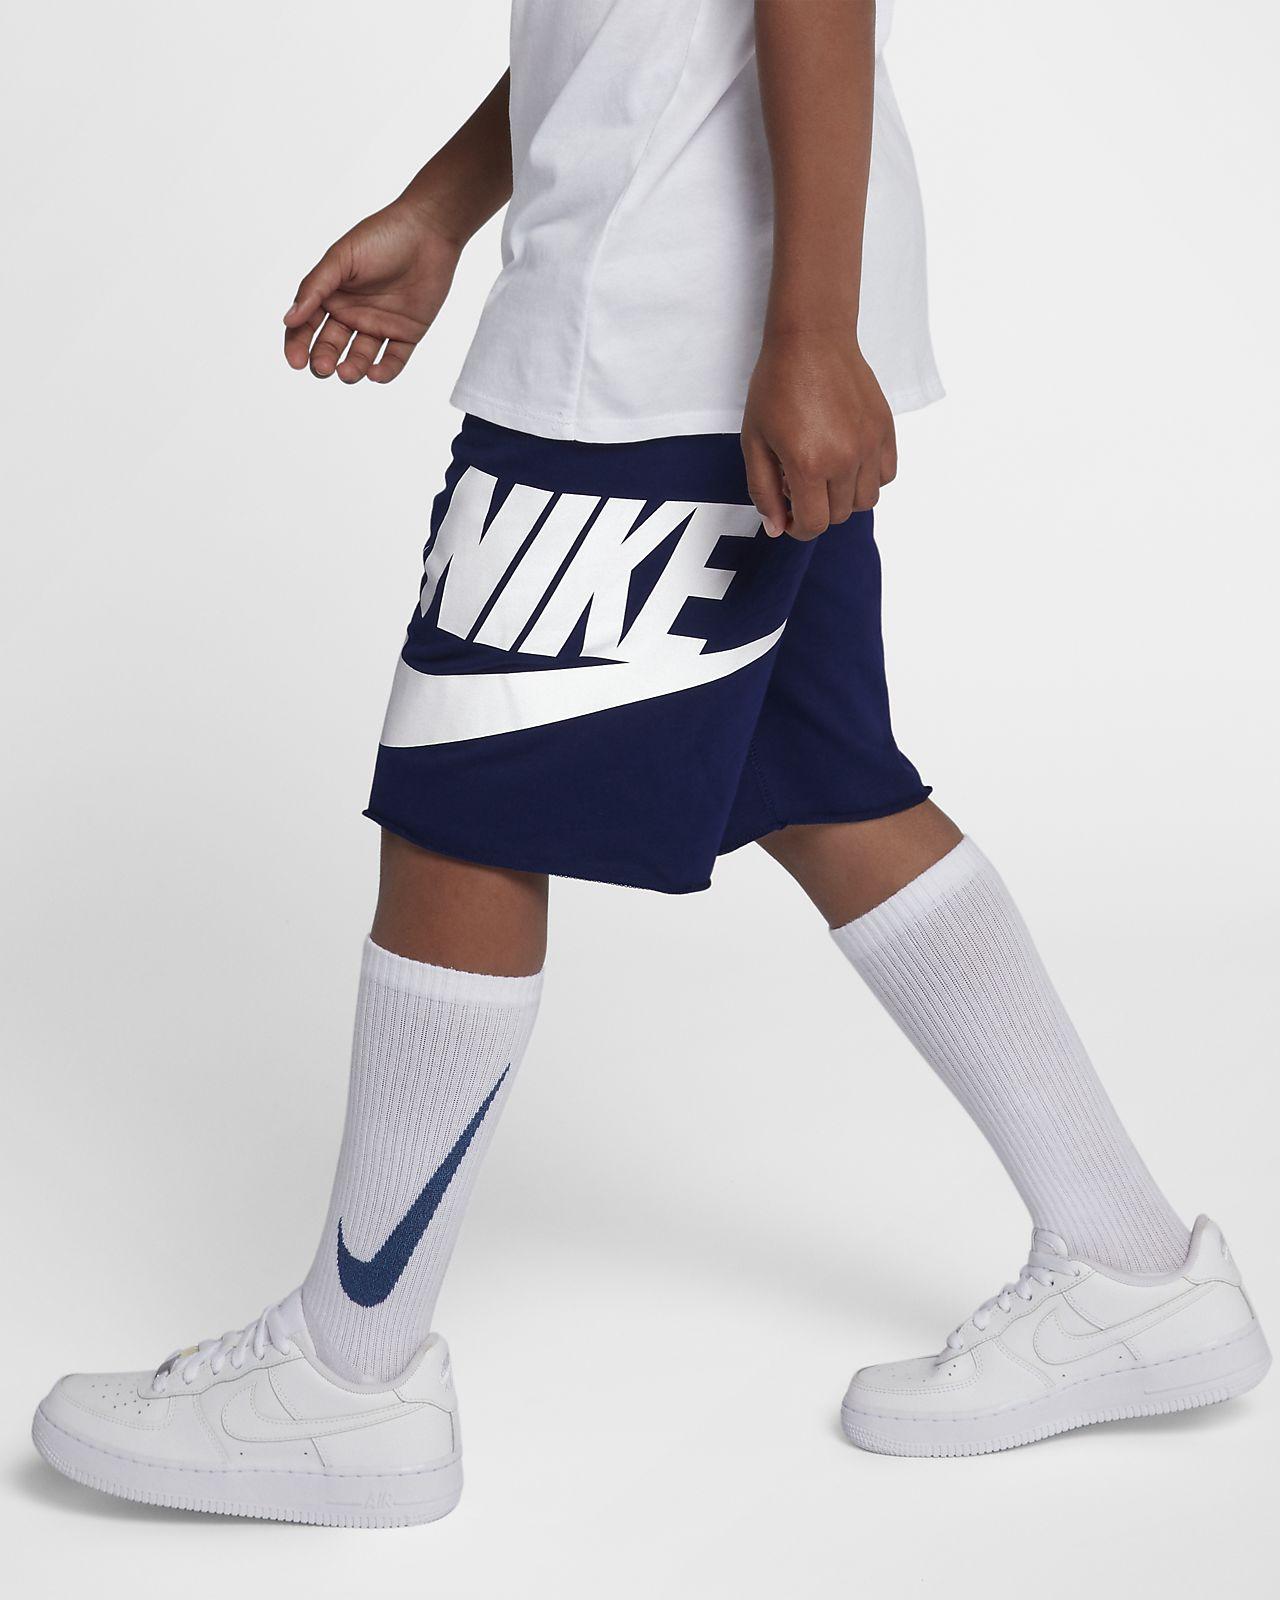 5a5d61ccd5 promo code jordan trunner lx og retro training shoes big kids 905223 001 sh  7f98e 47b79  netherlands nike sportswear alumni older kids boys shorts  afa5e ...